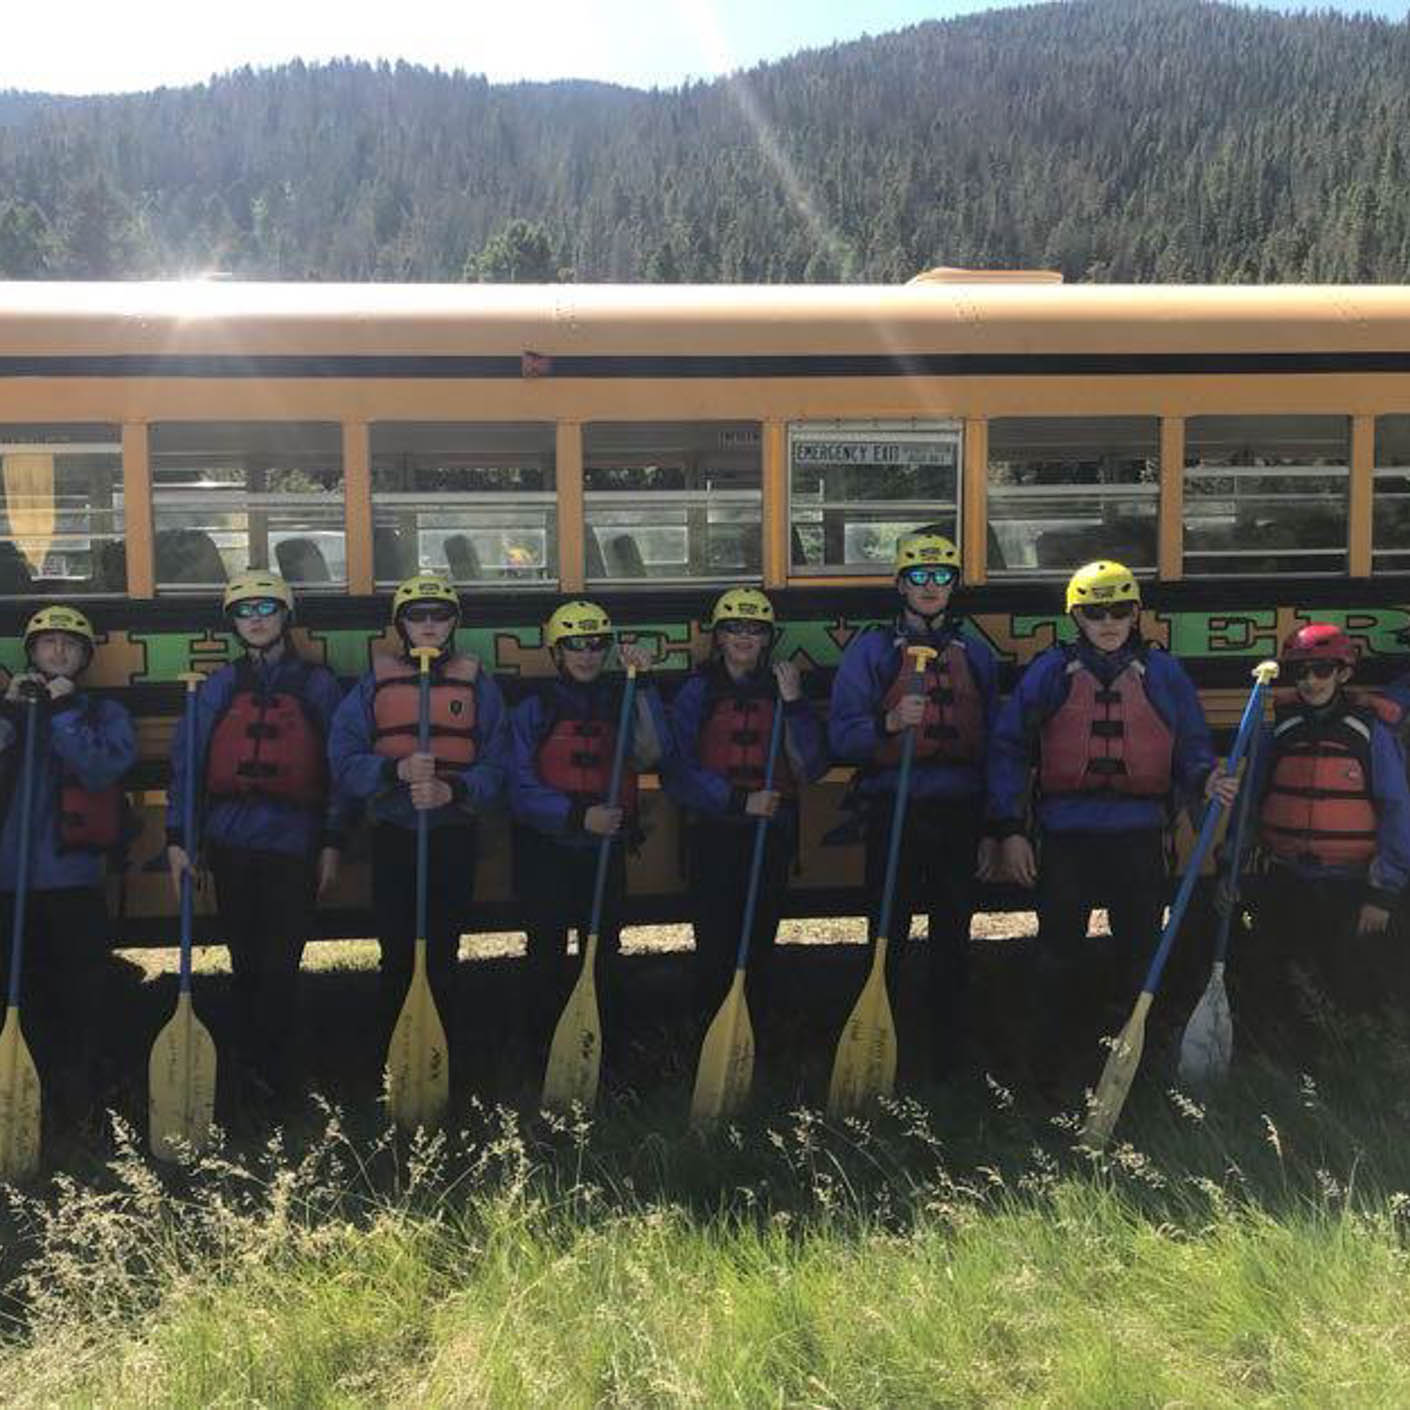 Montana Fly Fishing whitewater rafting